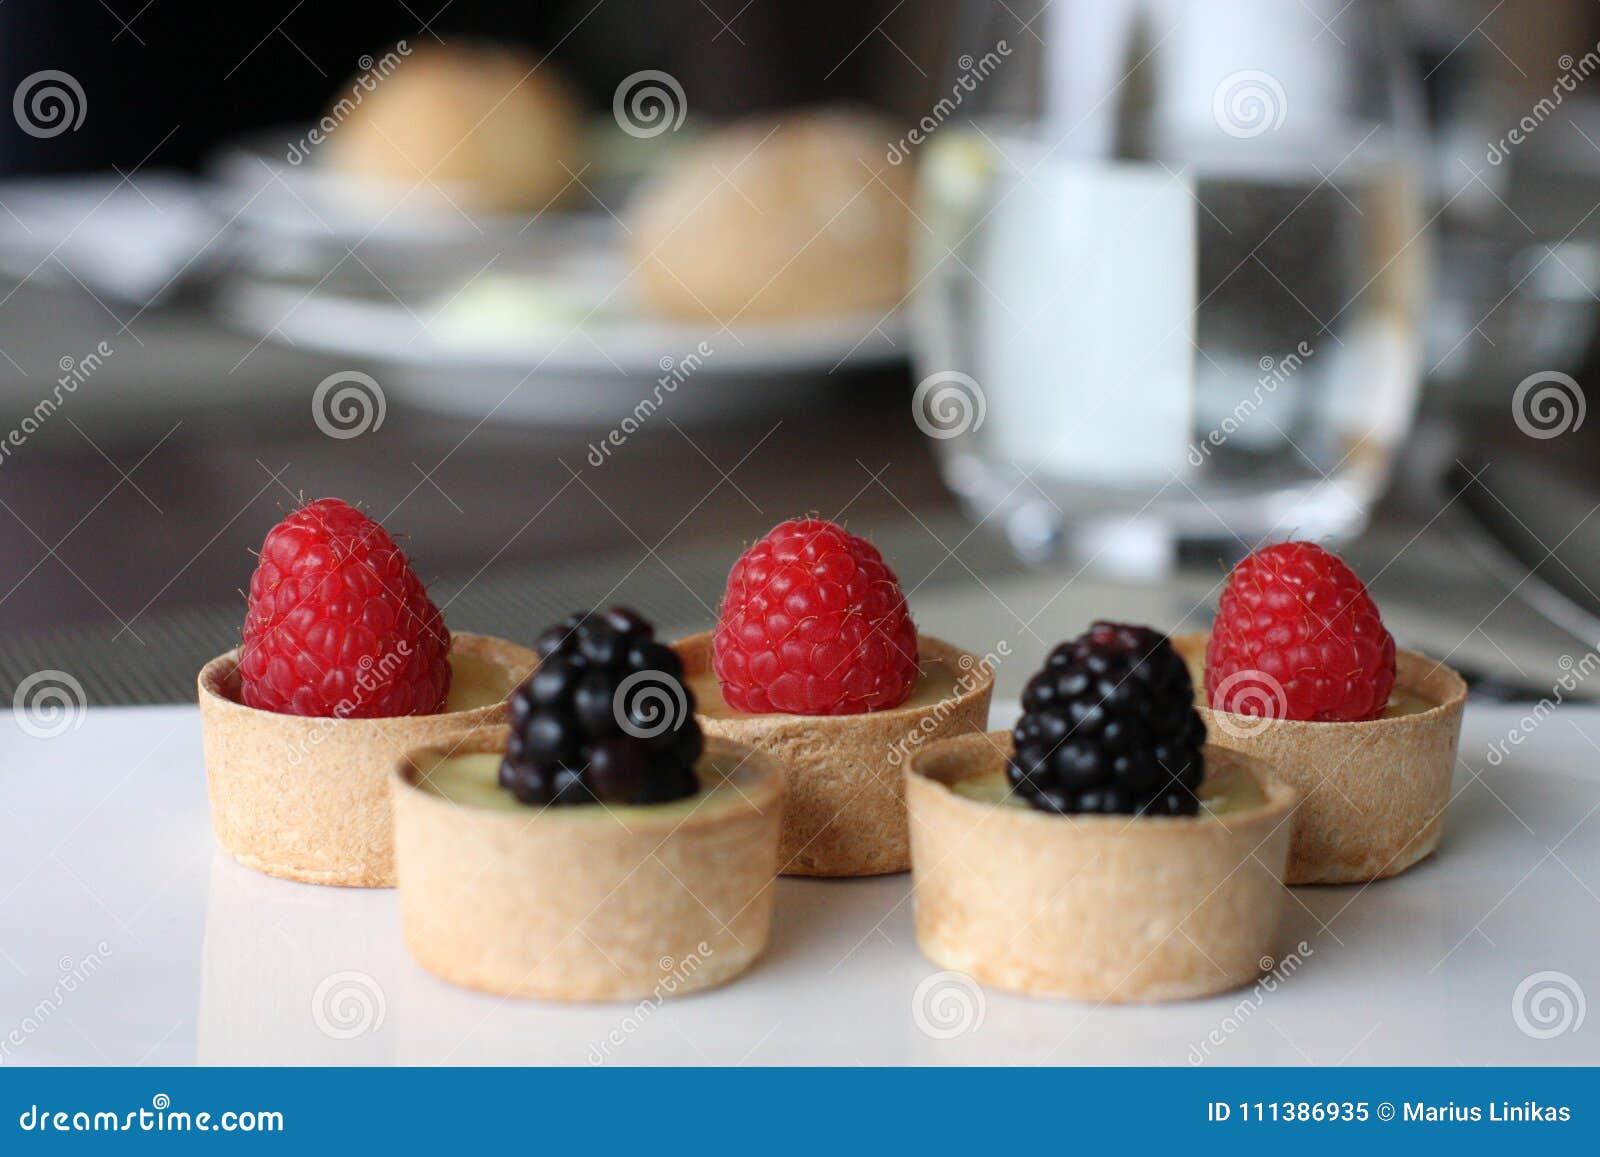 Morsi dolci del ristorante, piccole tazze dolci del berrie